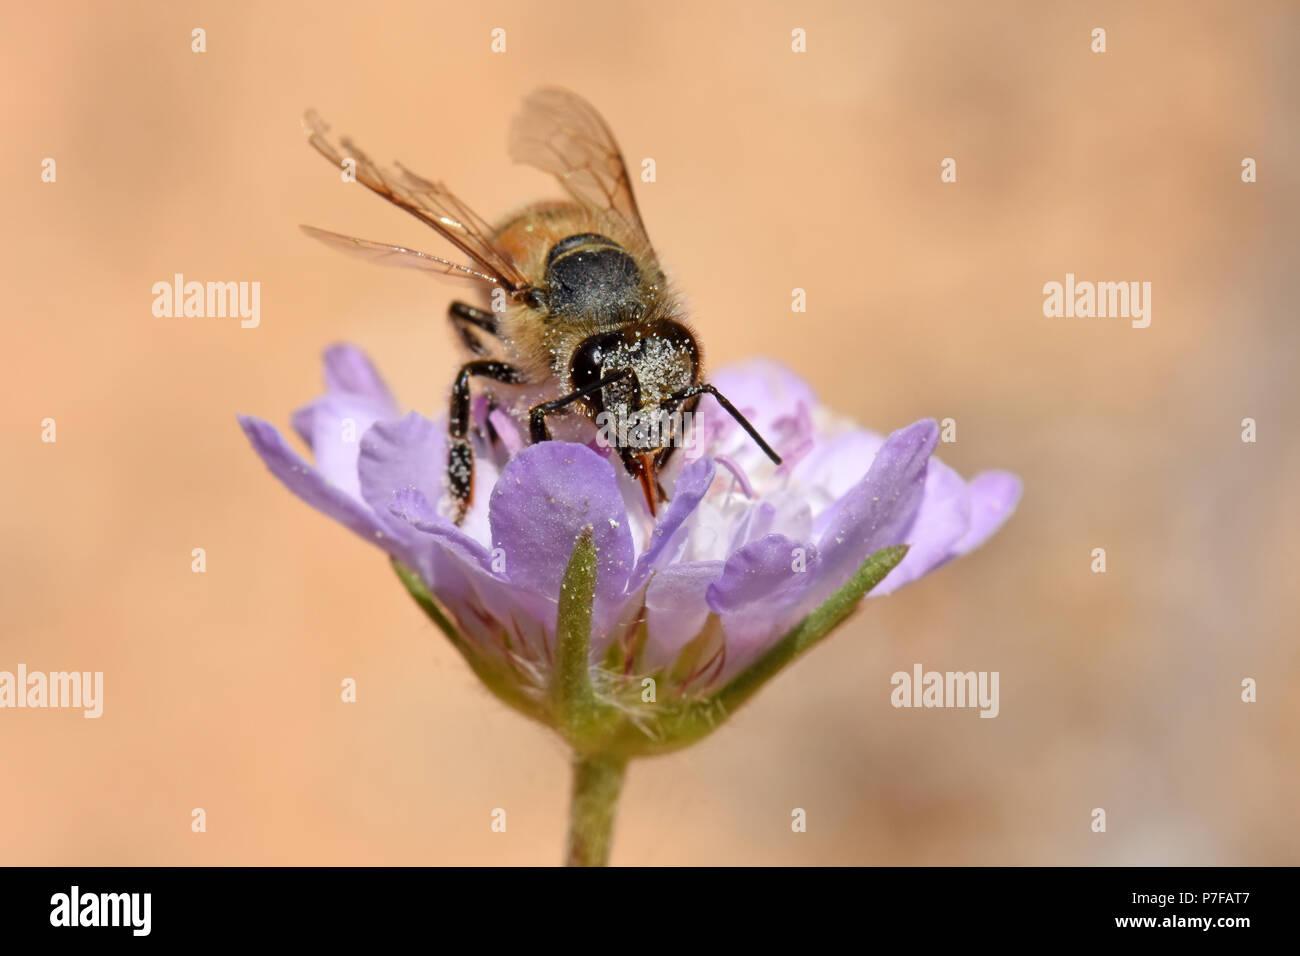 Honeybee pollinating flower - Stock Image